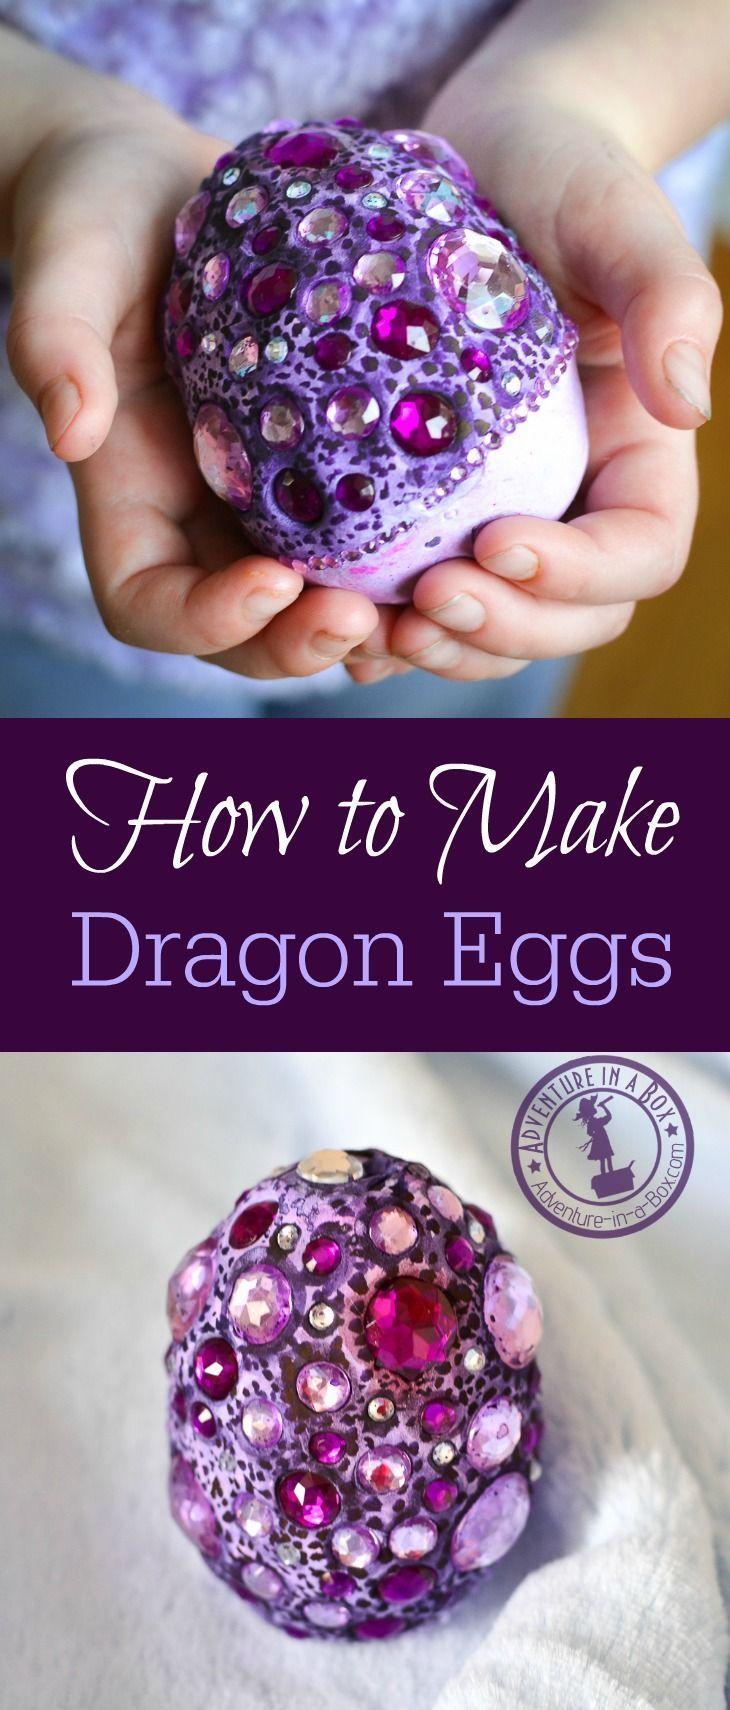 How to Make Fantasy Dragon Eggs Dragon egg, Air dry clay